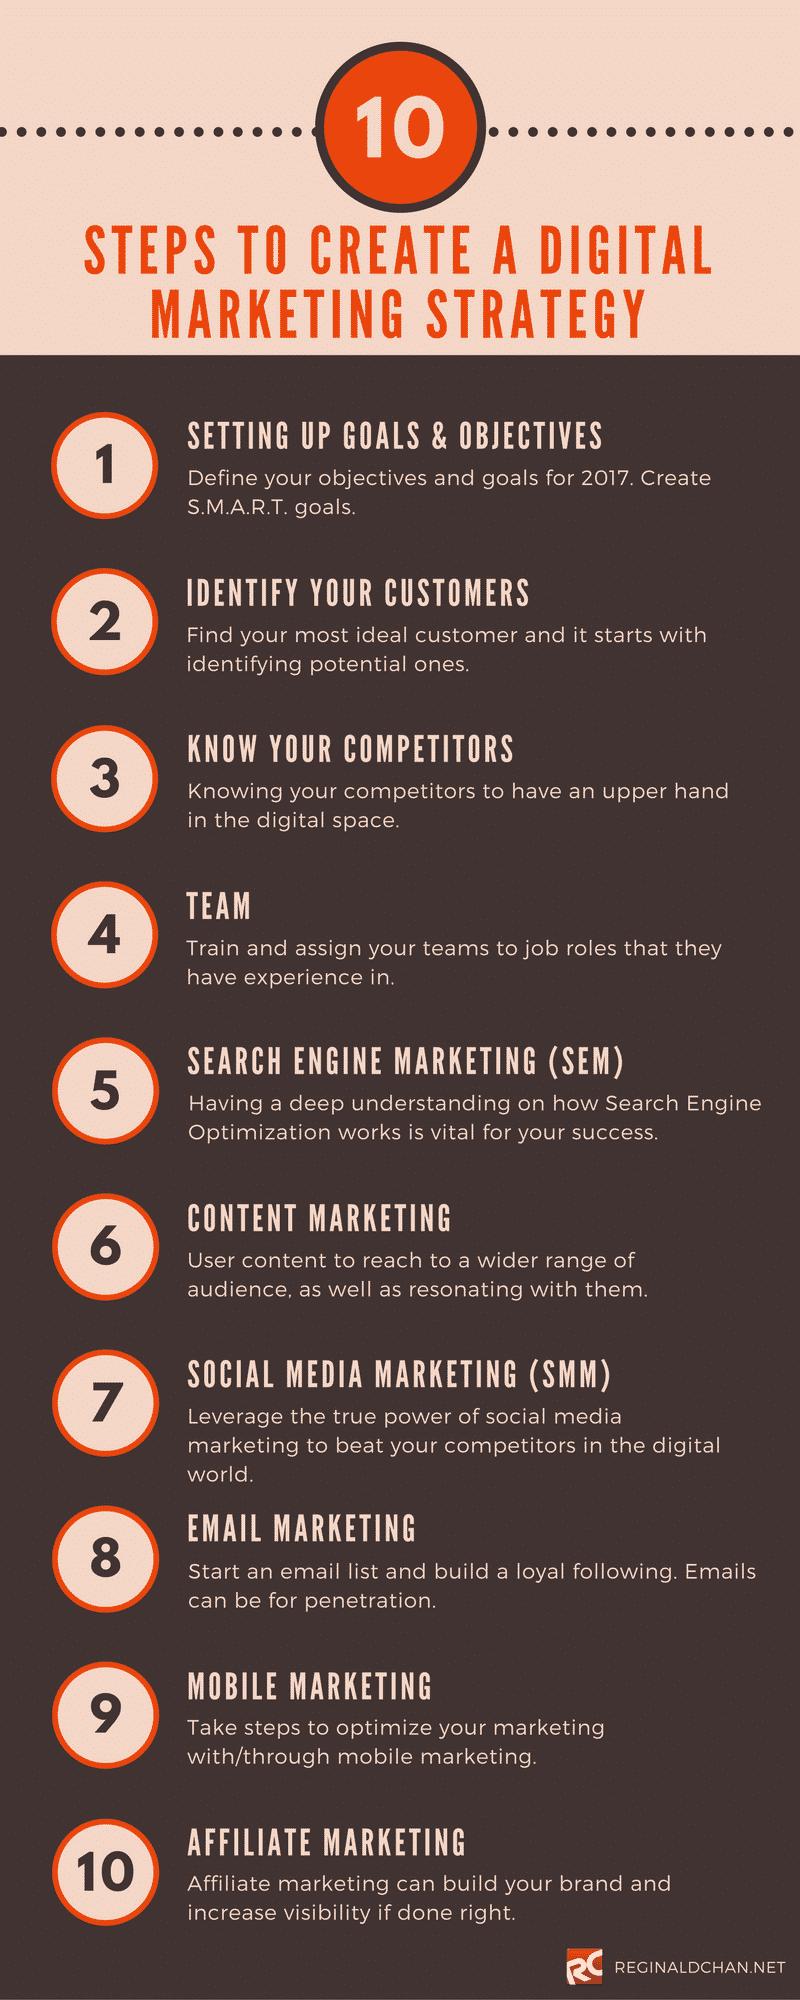 Creating a b2b digital marketing plan for 2017 infographic smart - Creating A Digital Marketing Strategy 2017 10 Simple Steps